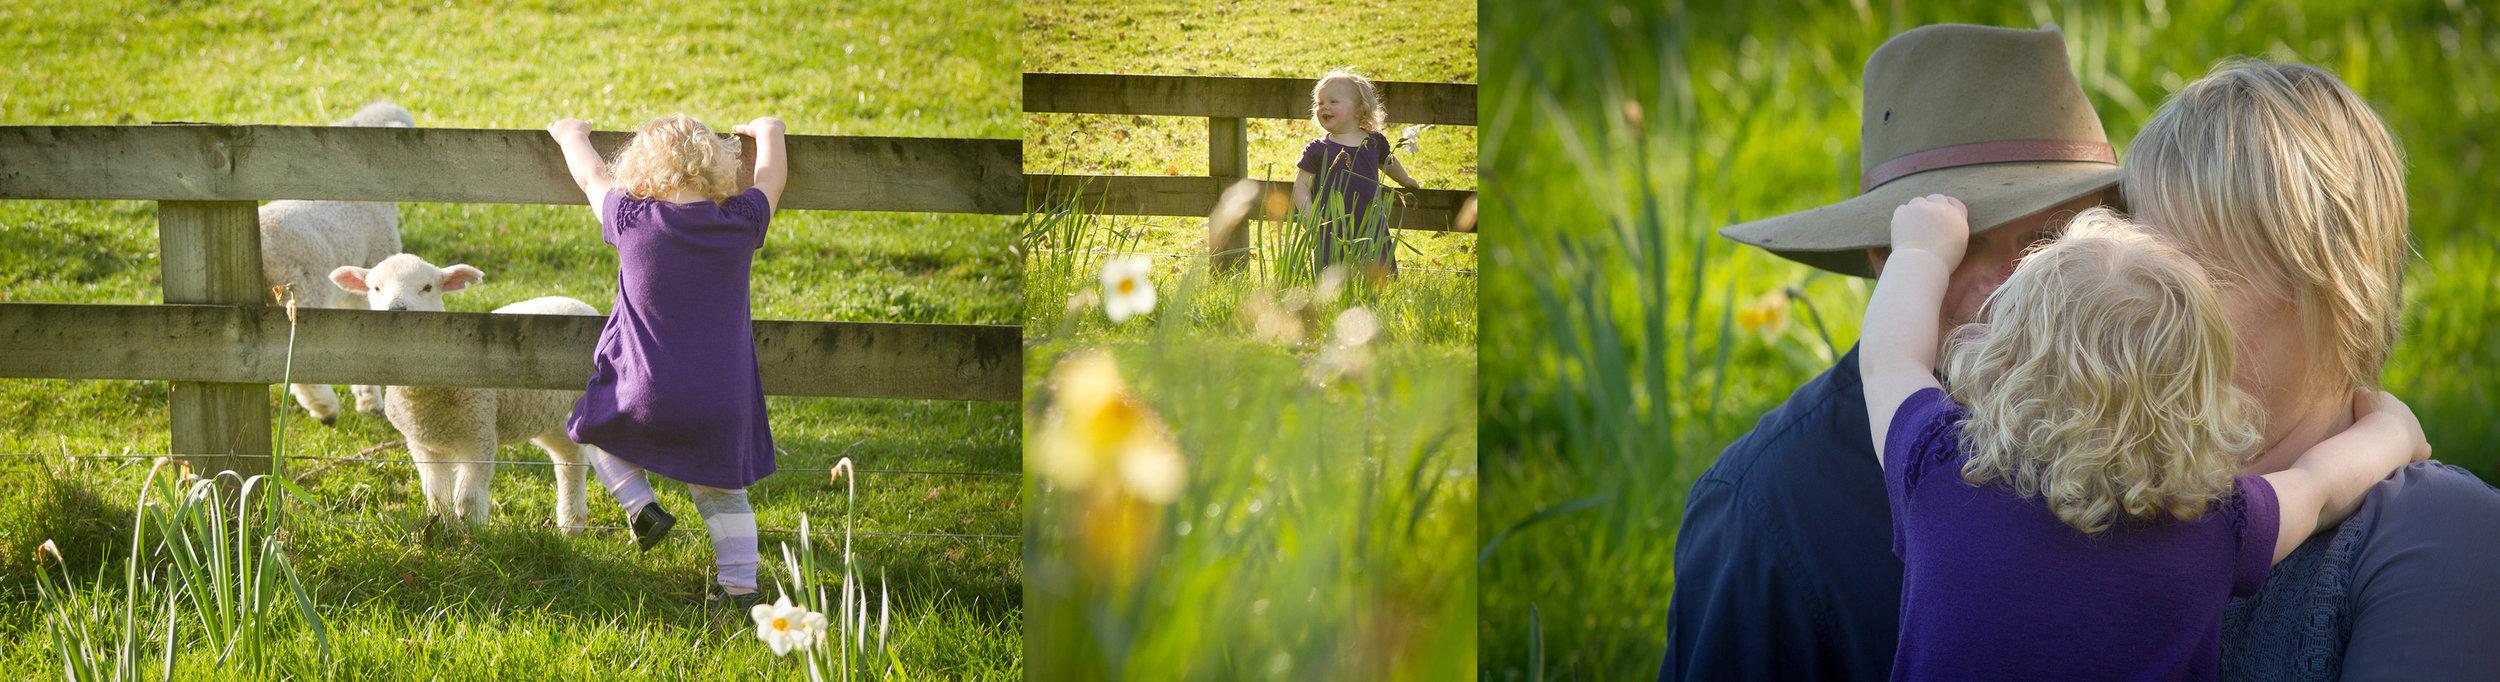 King-Country-childrens-photographer.jpg